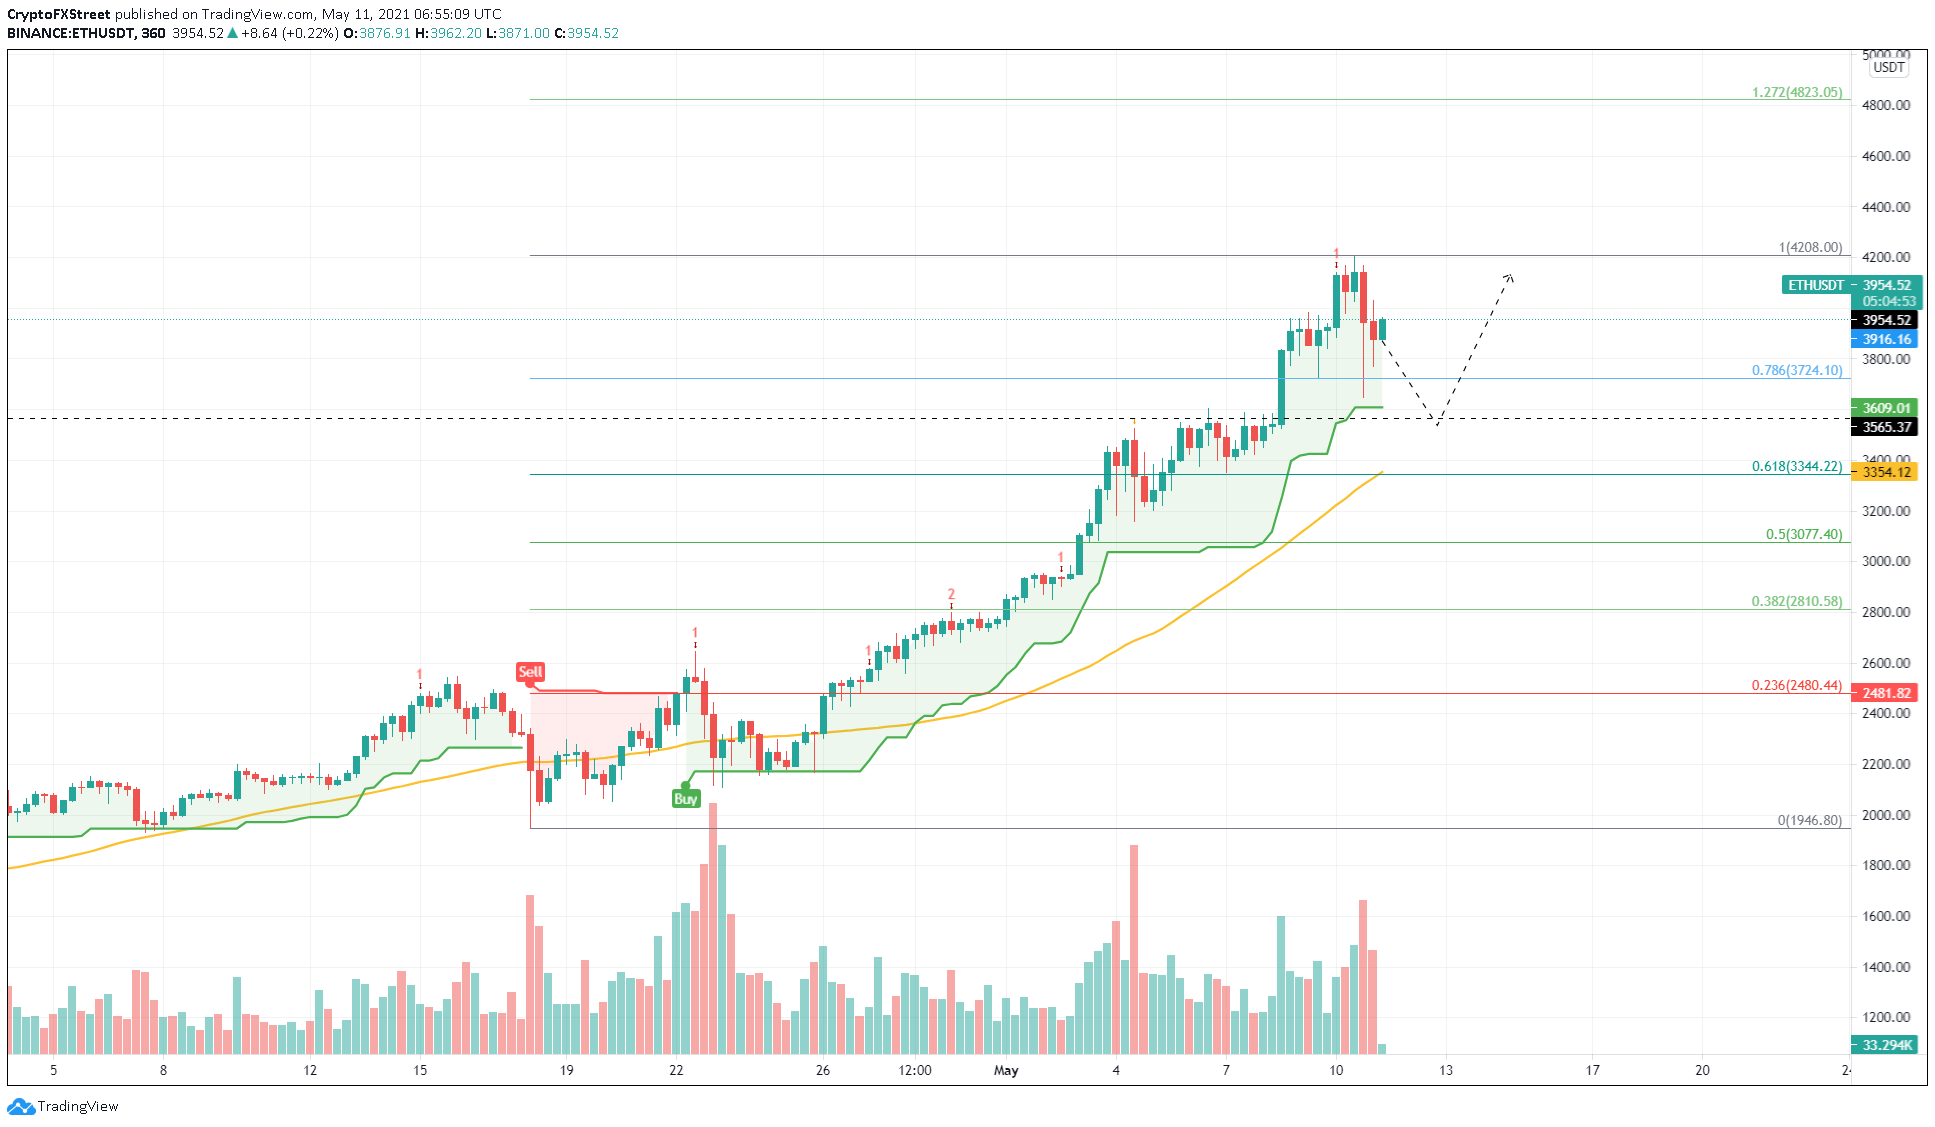 ETH/USDT 6-hour chart